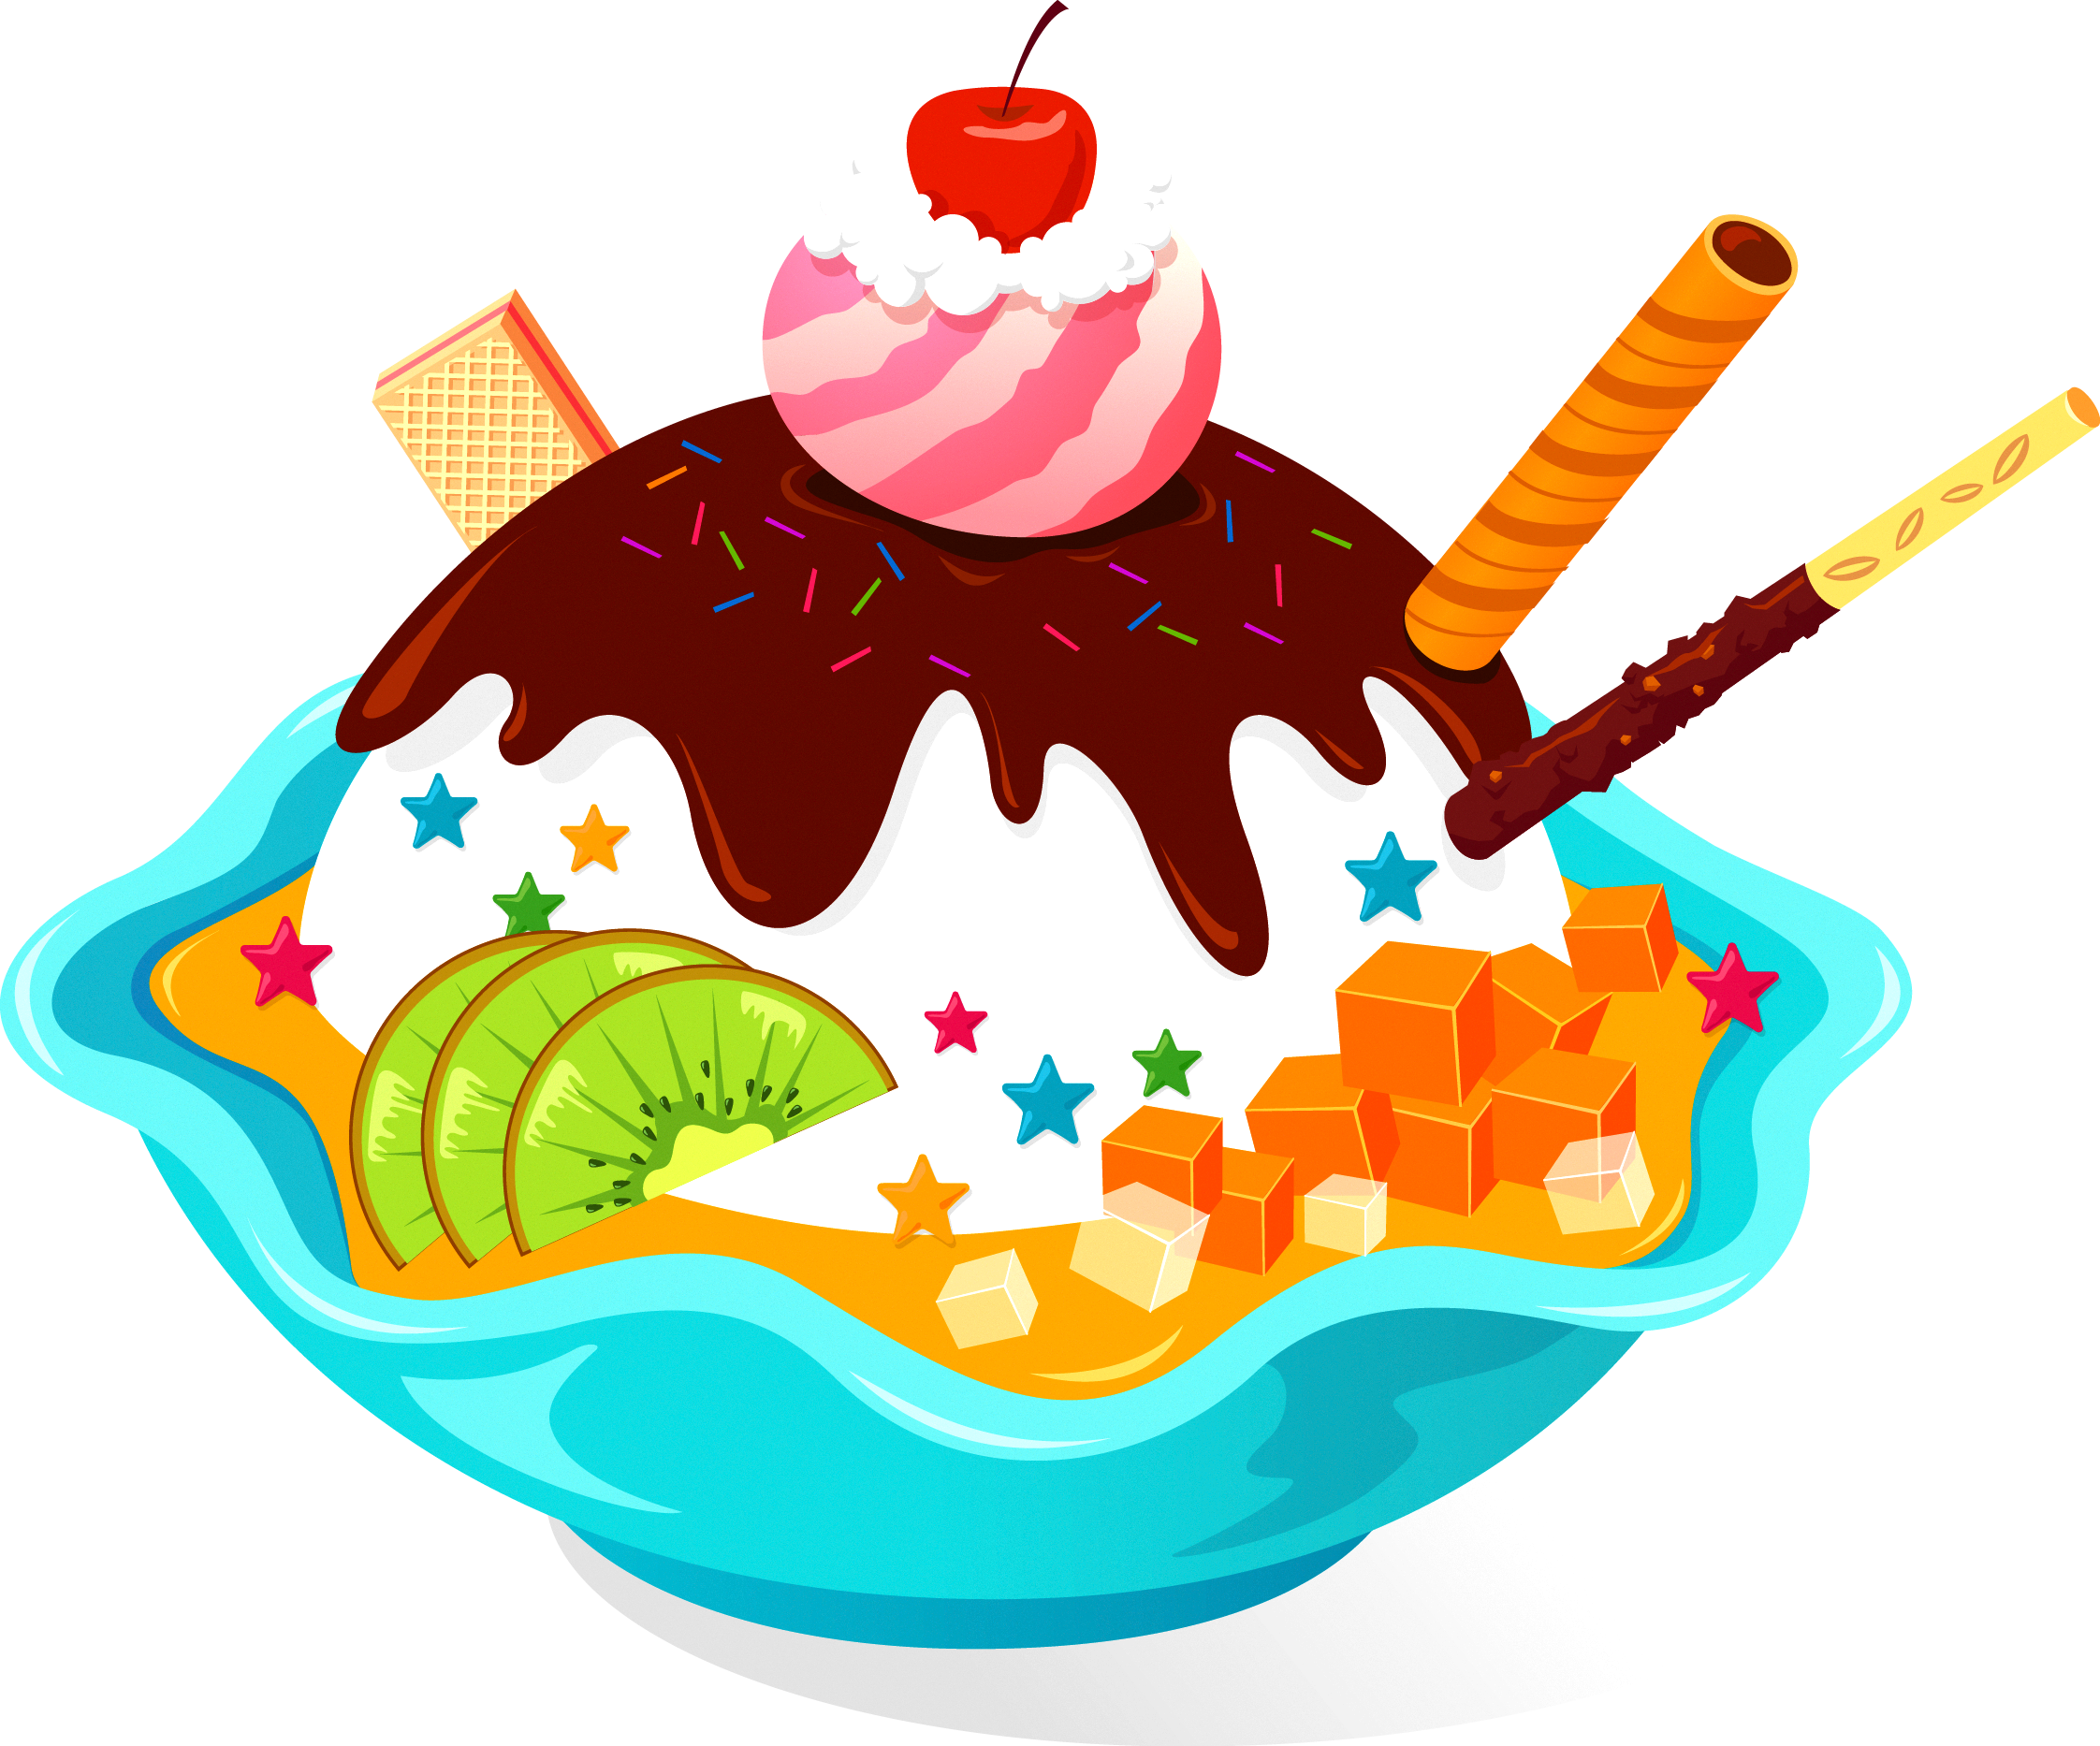 Cake cone cupcake. Dessert clipart banana split ice cream